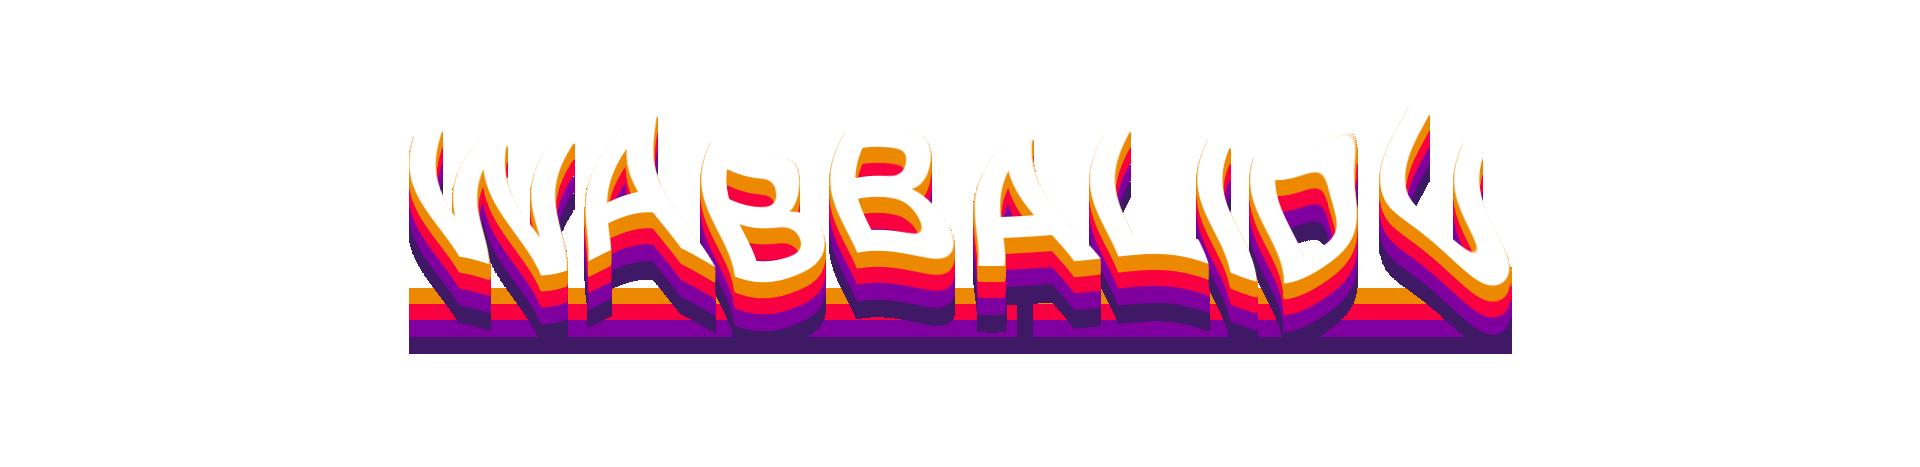 Wabbalidu